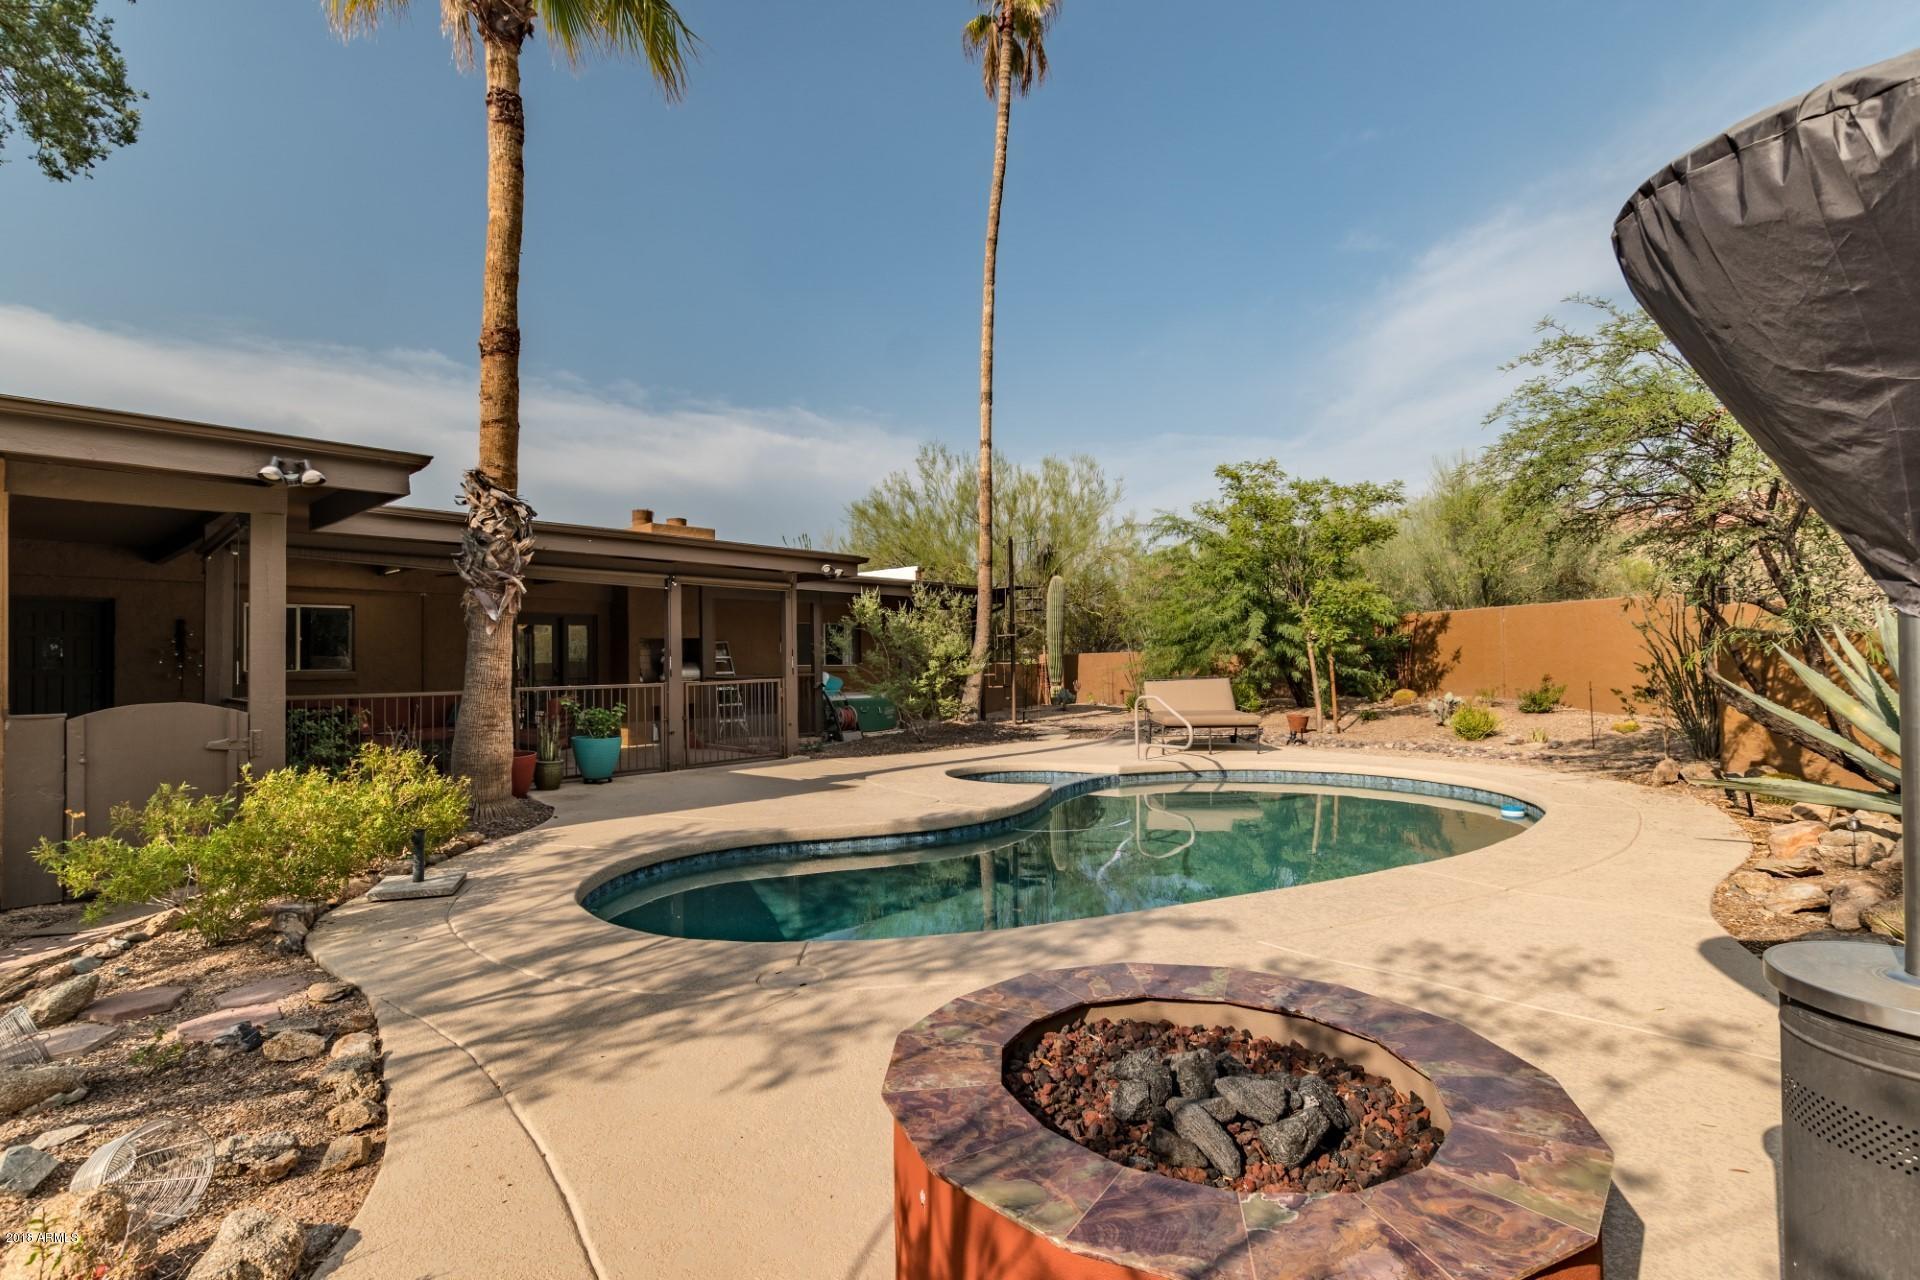 MLS 5804408 7737 E ROCKING CHAIR Road, Carefree, AZ 85377 Carefree AZ Affordable